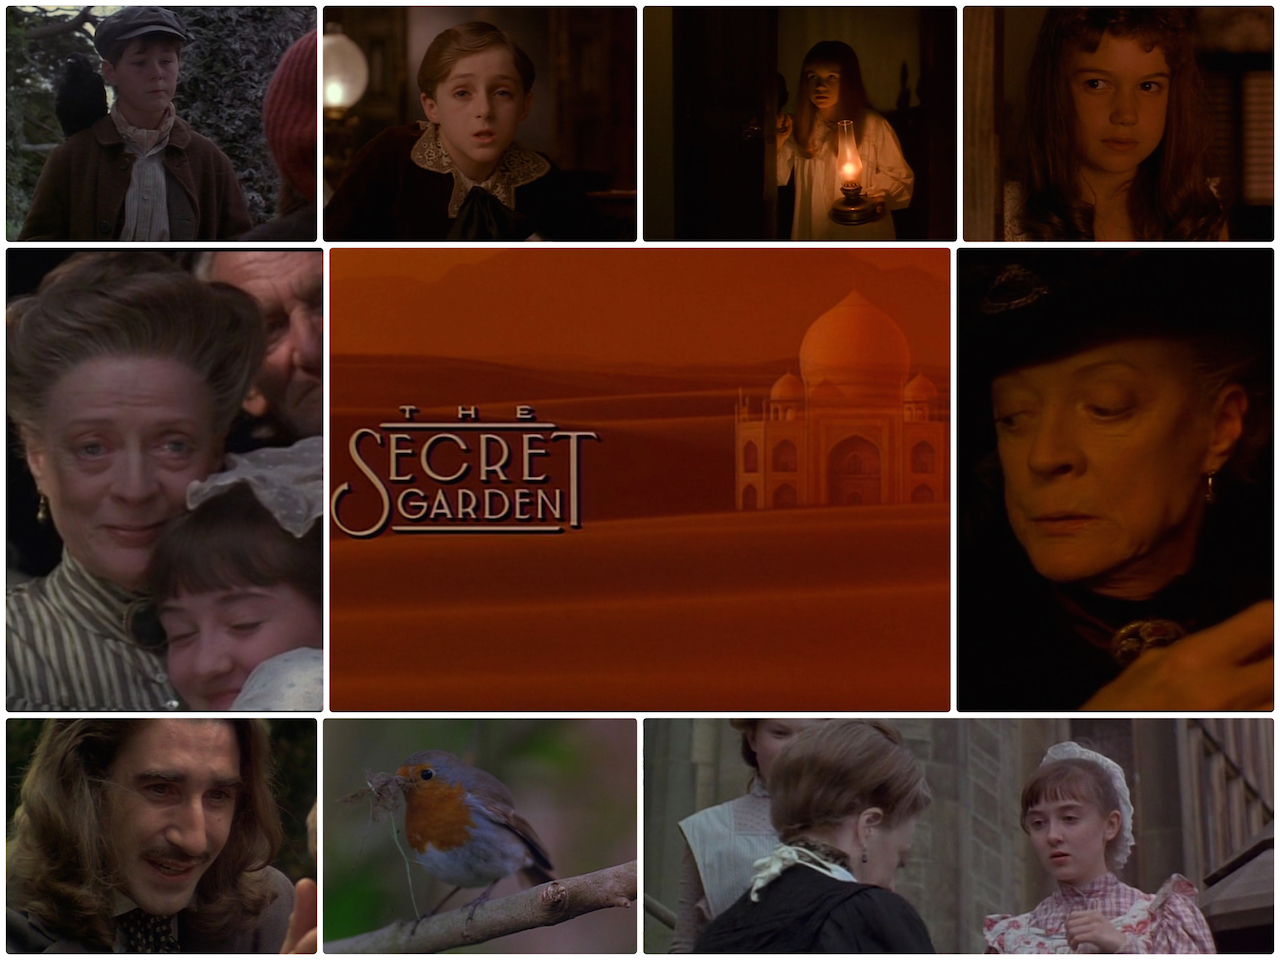 Last Film I Watch] The Secret Garden (1993) – Cinema Omnivore